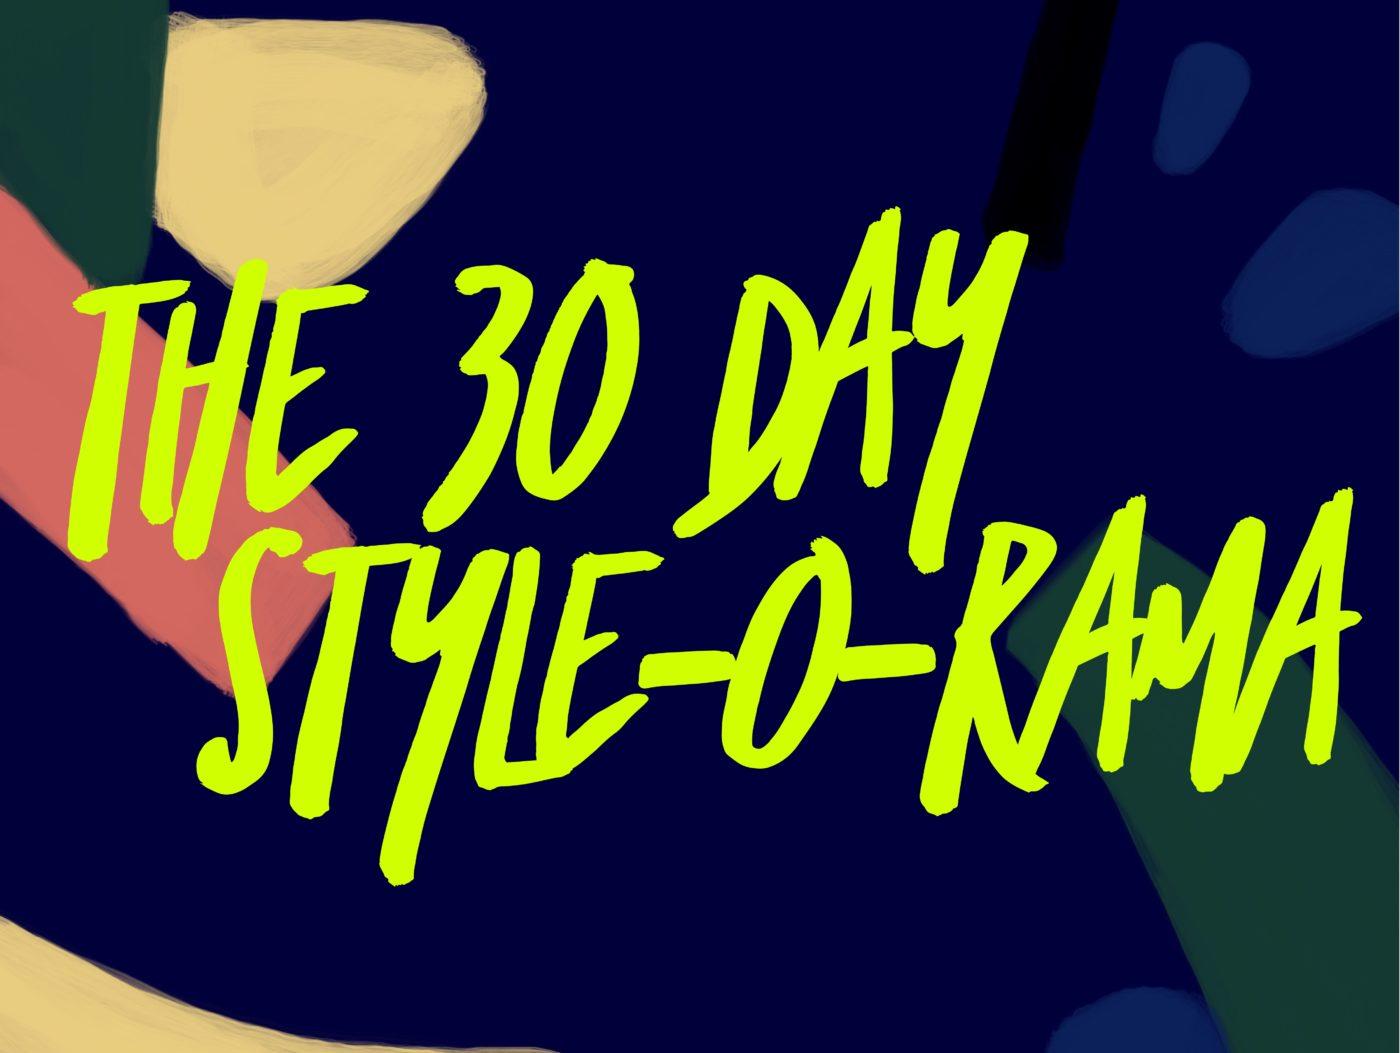 Style-O-Rama